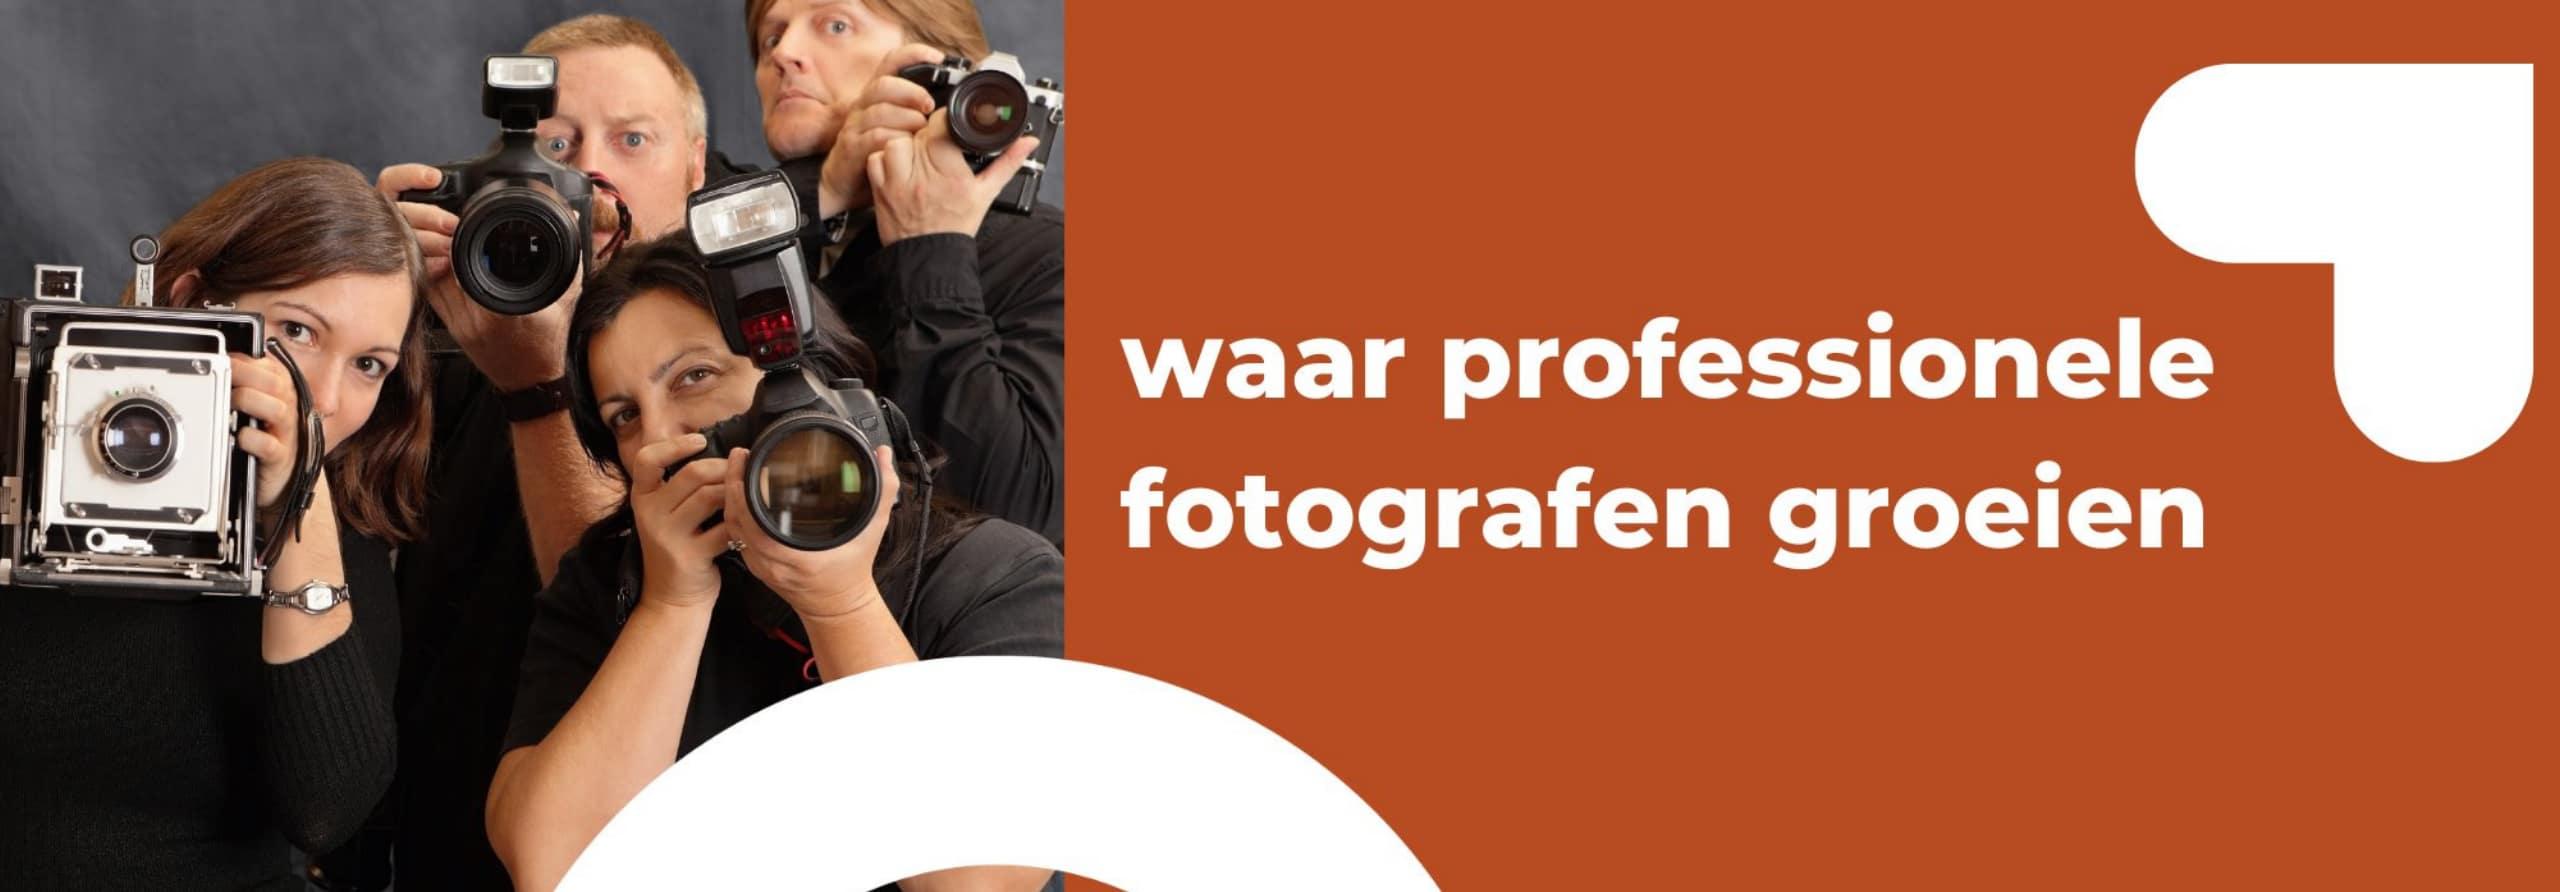 Beroepsfotografen.be  x Duaal digitaal